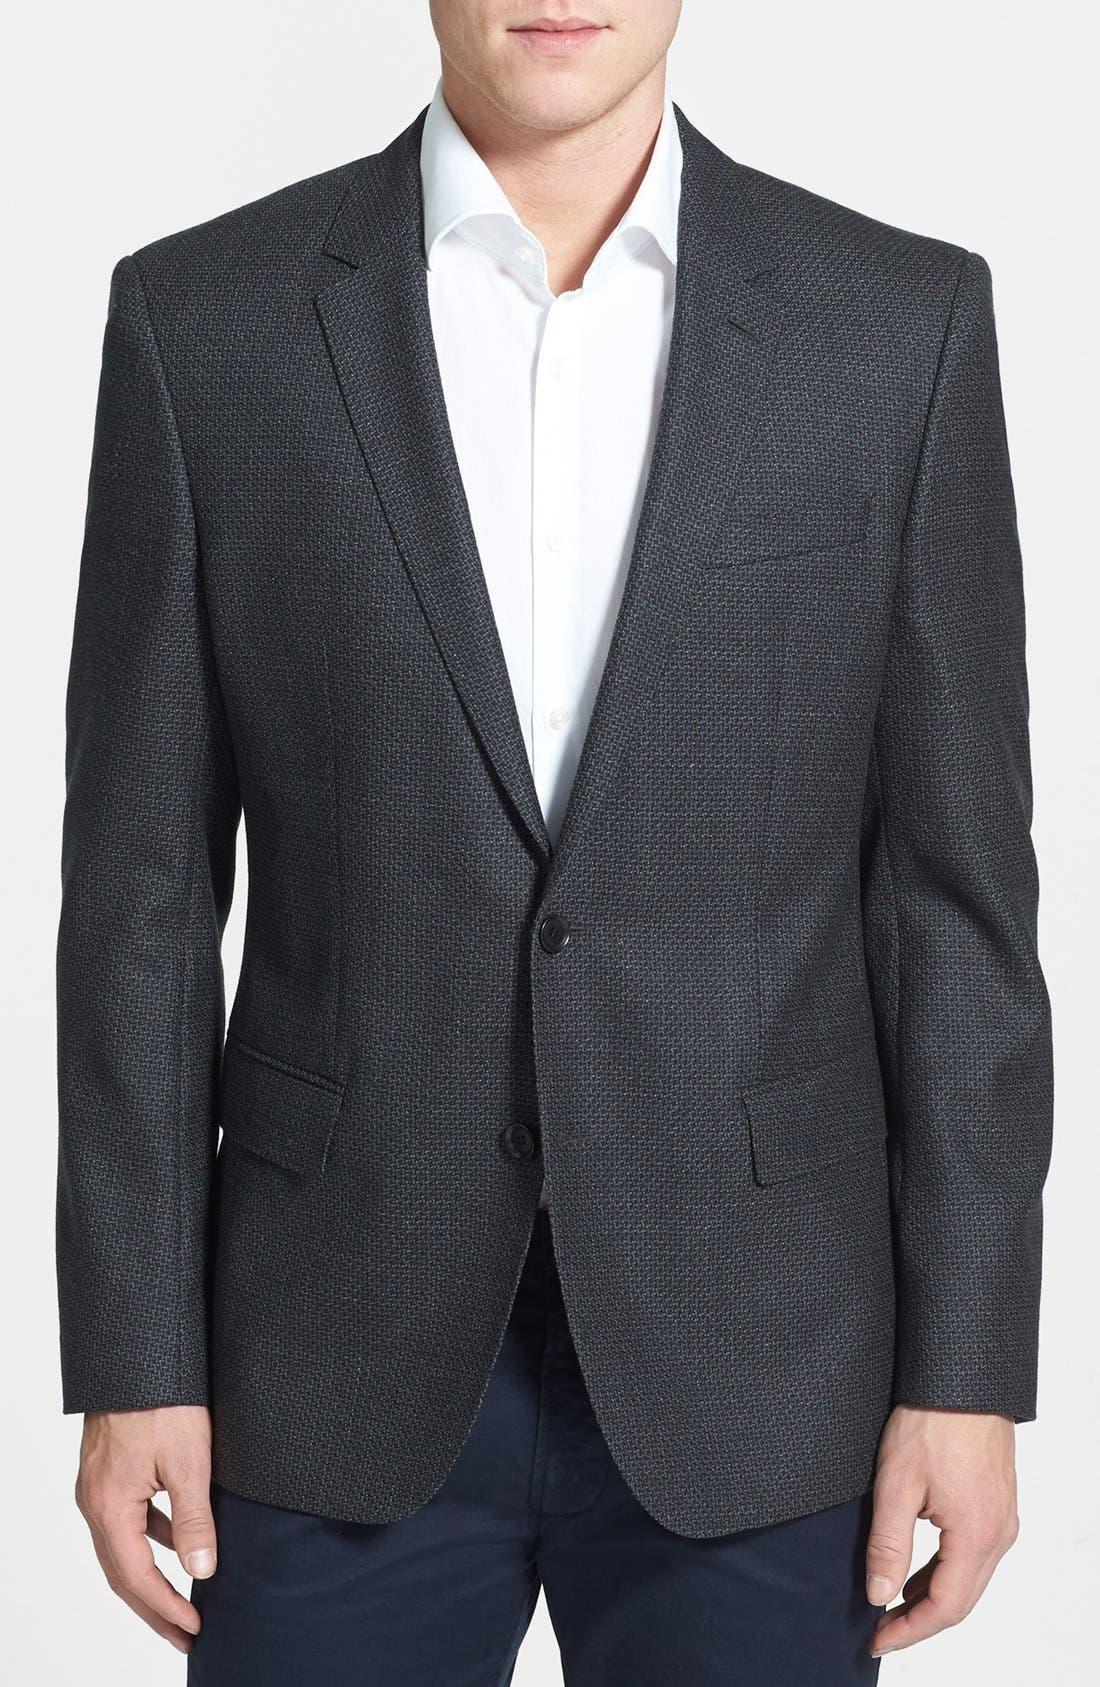 Alternate Image 1 Selected - BOSS HUGO BOSS 'Hutch' Trim Fit Wool Sportcoat